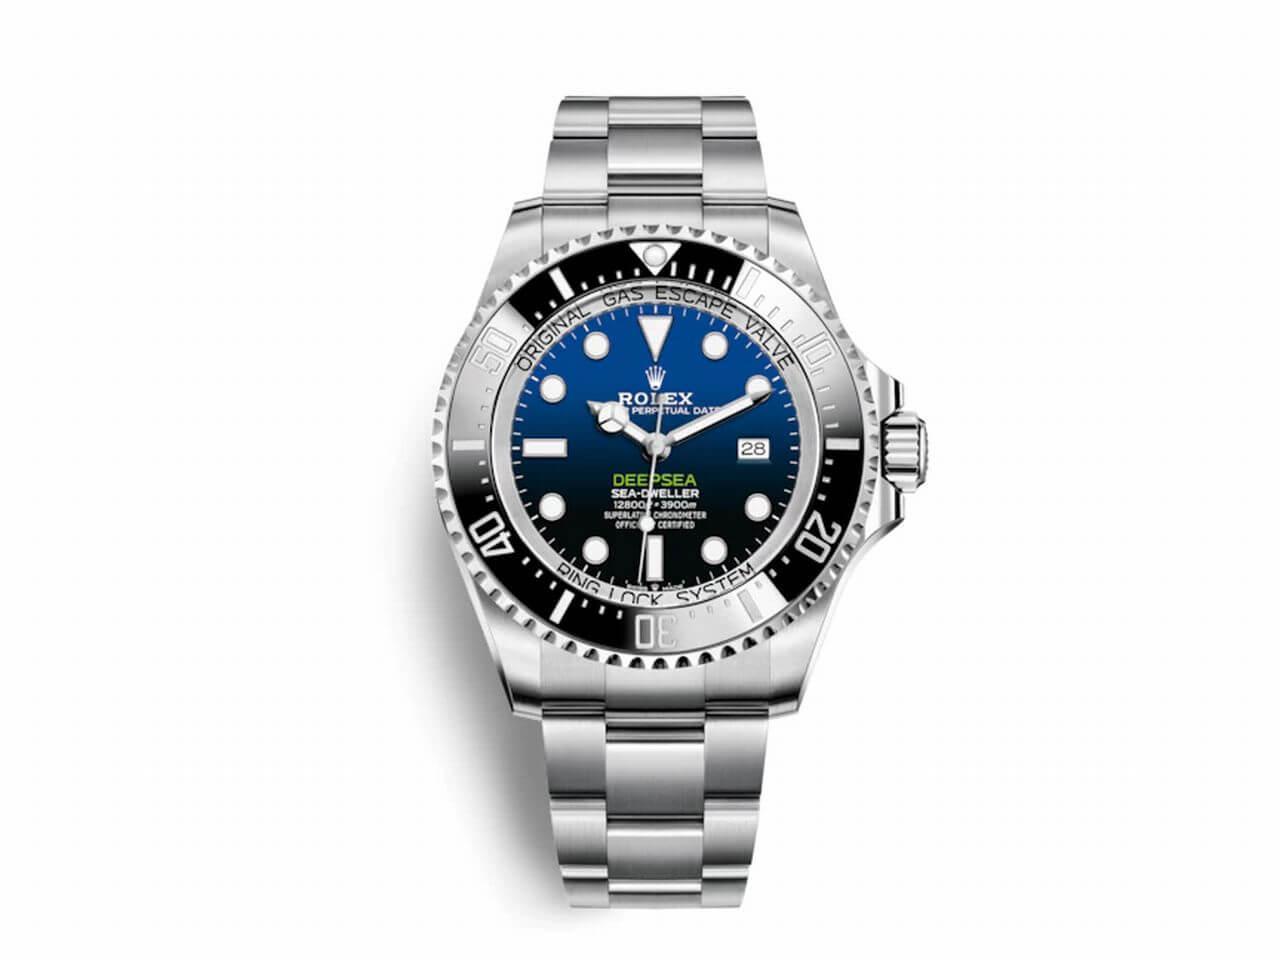 competitive price d2ba9 8a098 Ref.126660ロレックス2018新作ディープシーD-BLUEダイヤル ...